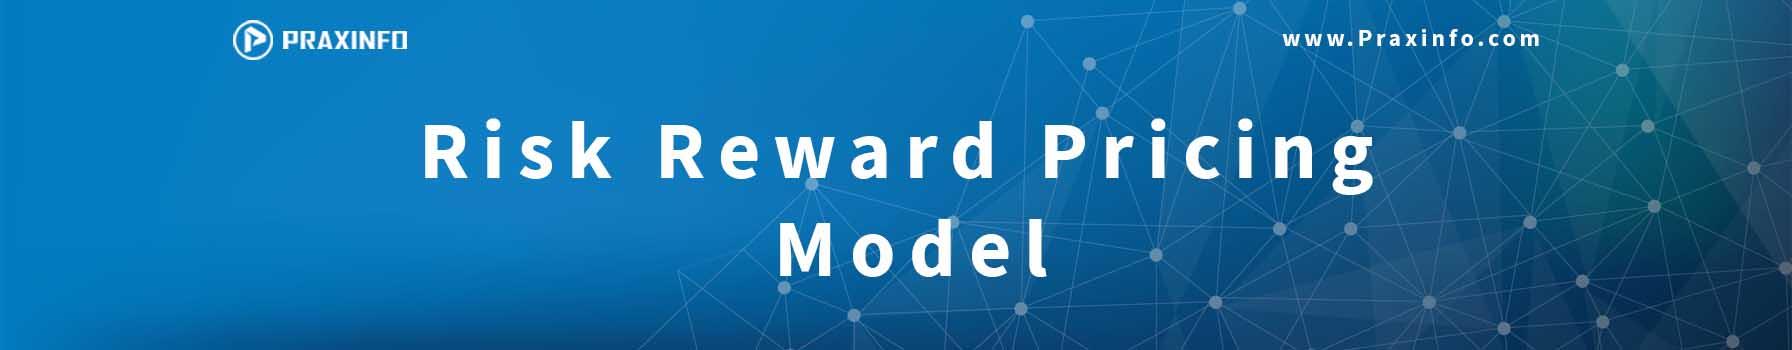 Risk-Reward-Pricing-Model.jpg